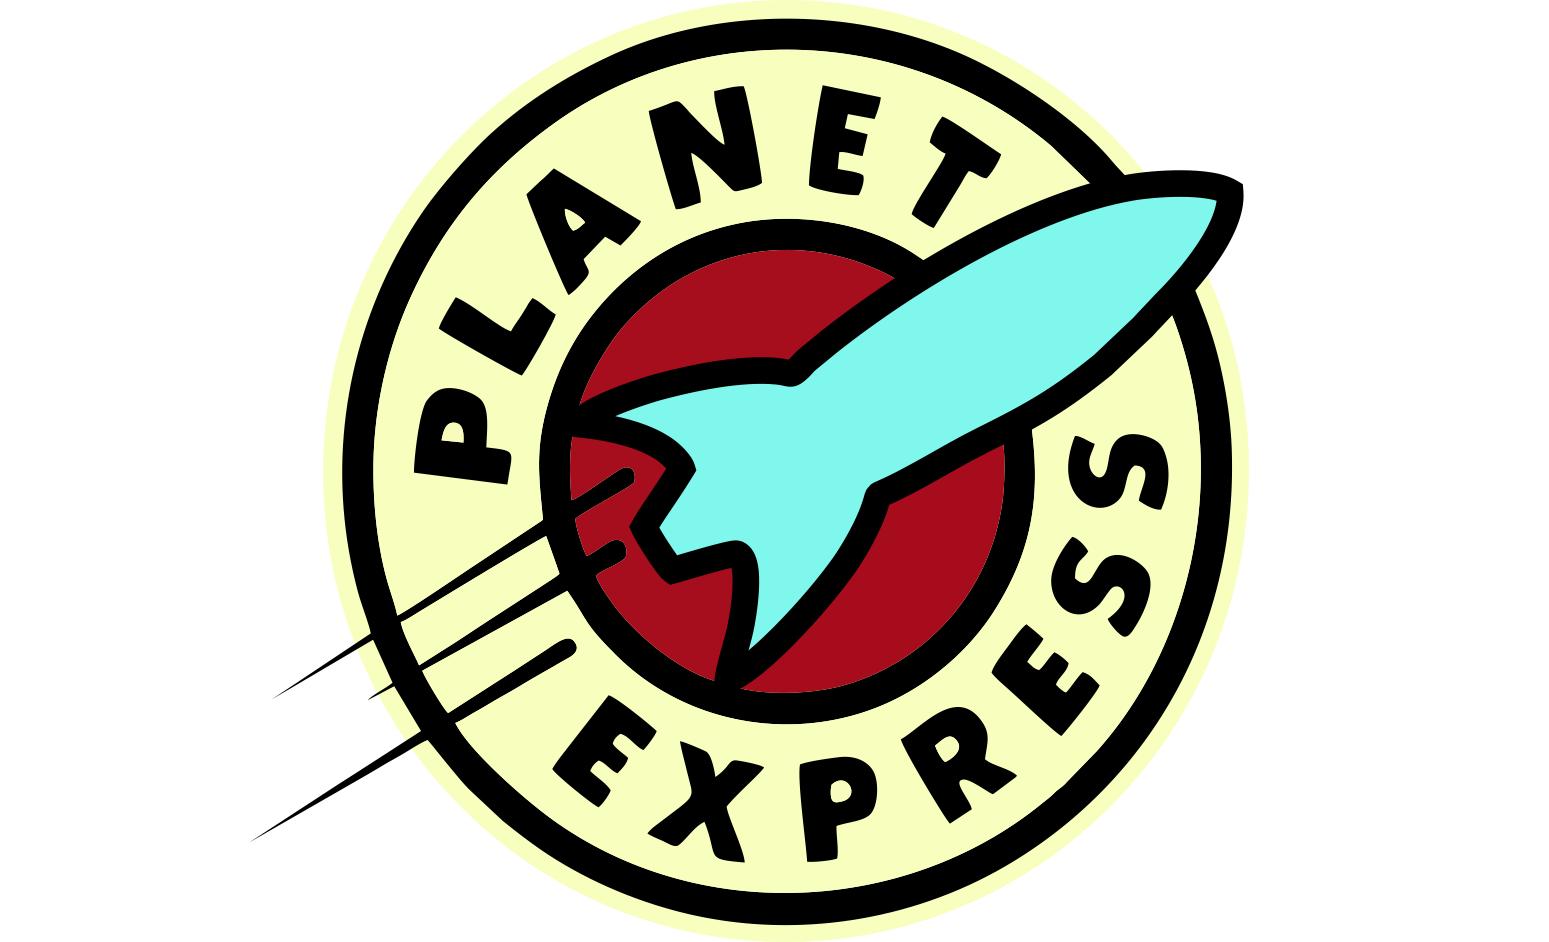 Planet Express Coupon Codes